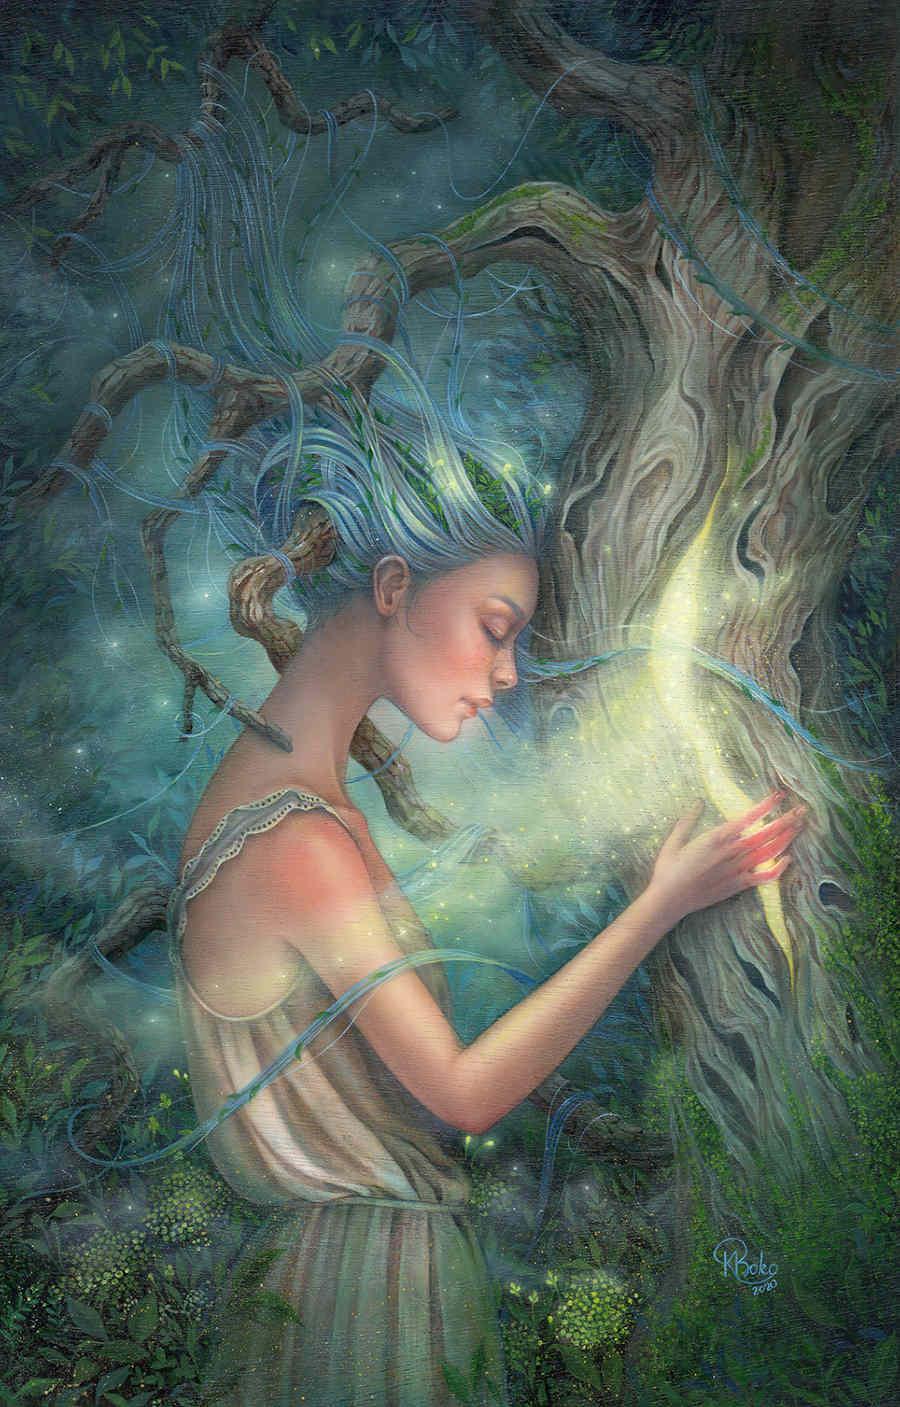 Kseniia-Boko-The-Heart-Tree